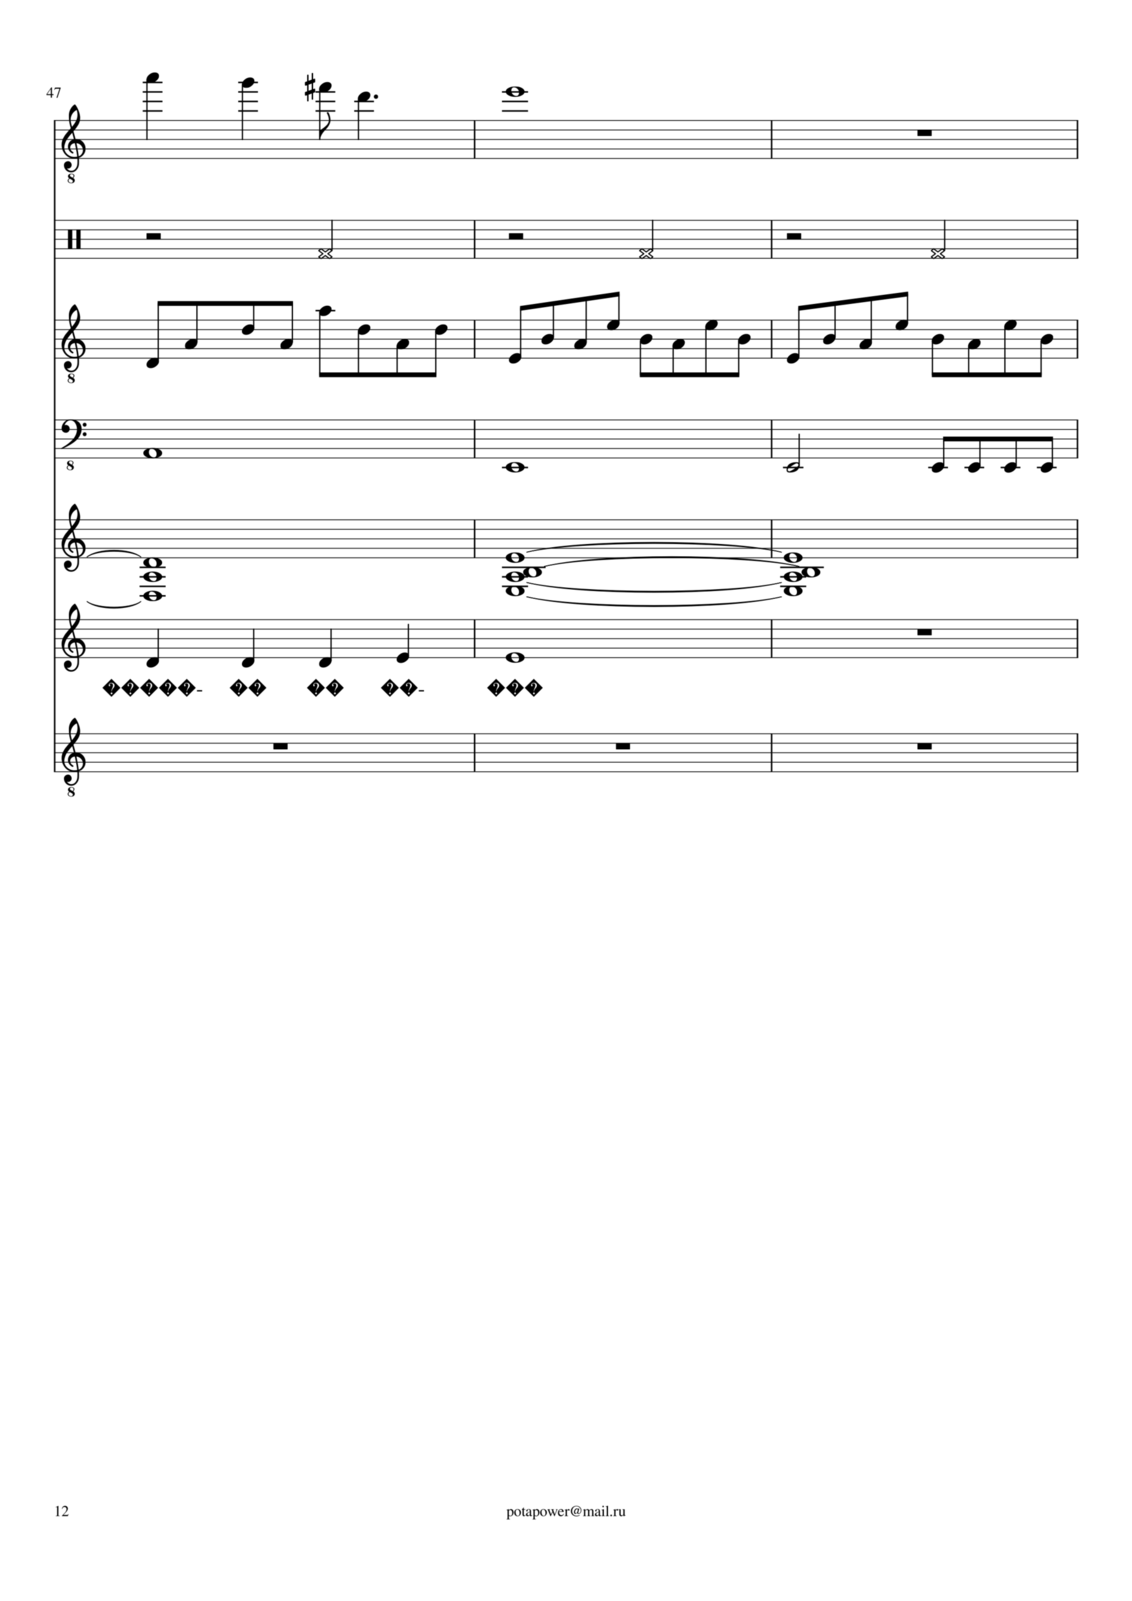 Ten lyubvi slide, Image 12